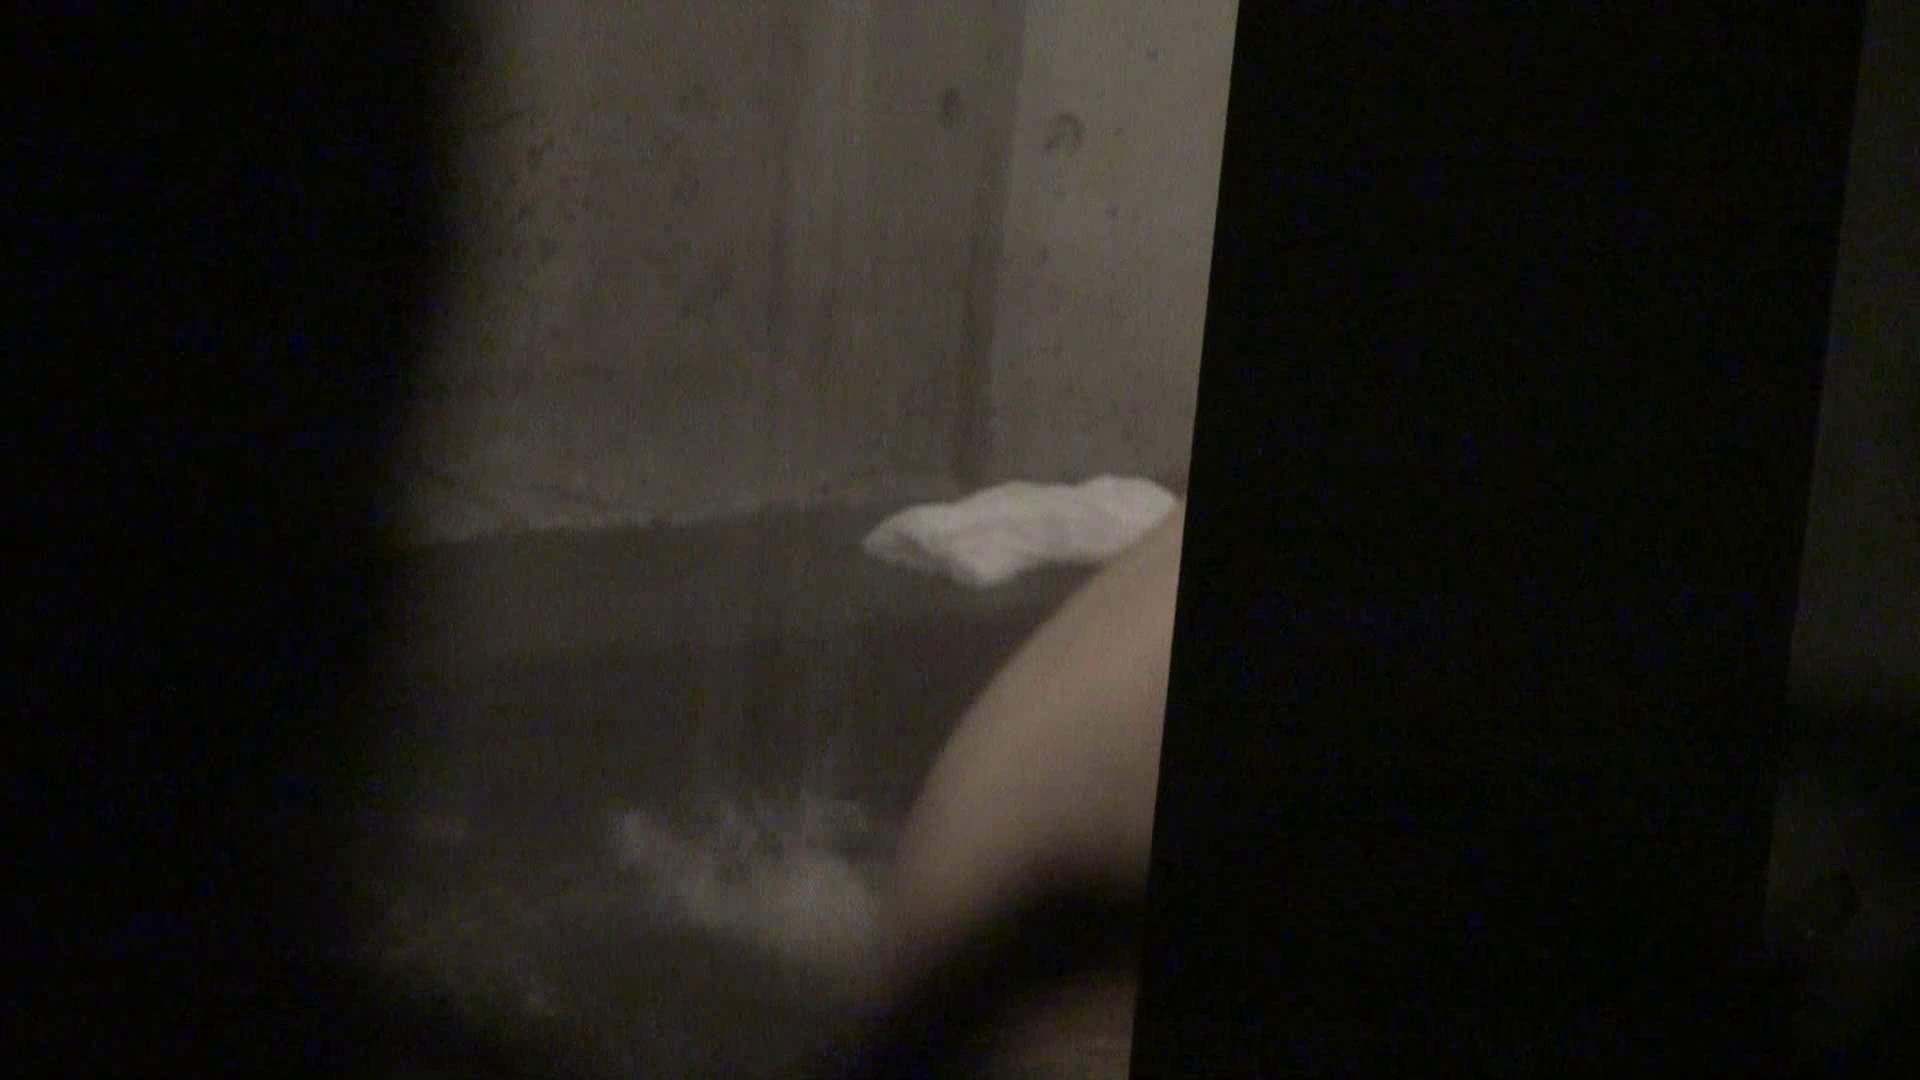 Aquaな露天風呂Vol.441 HなOL AV動画キャプチャ 89pic 87